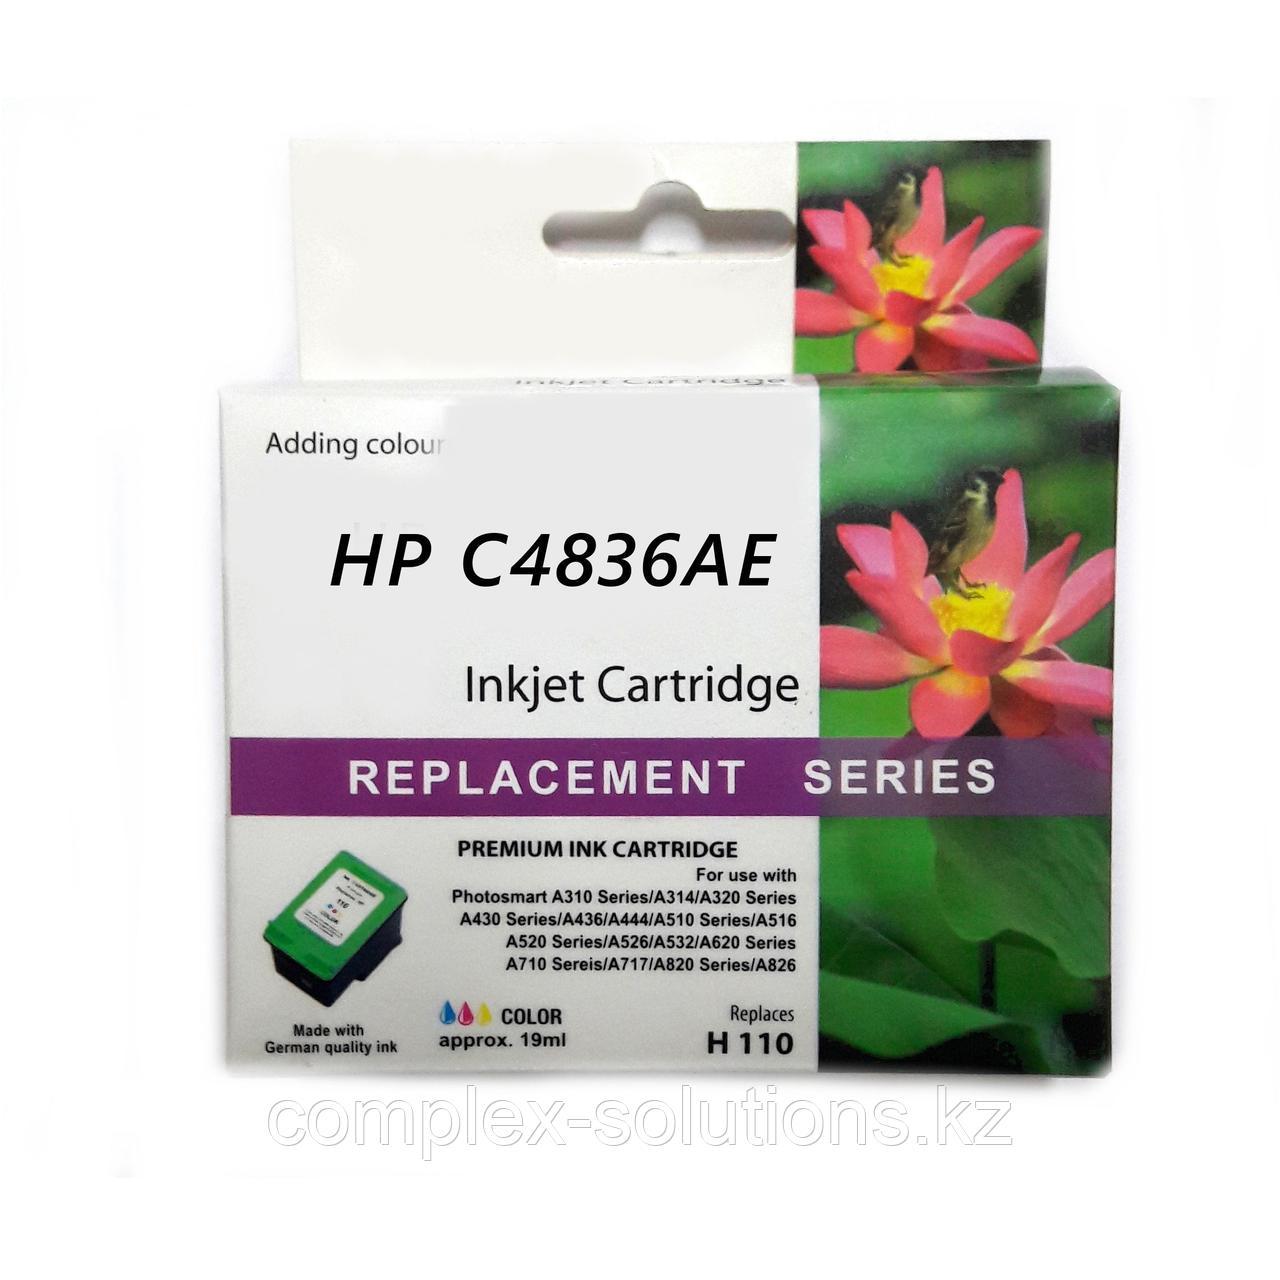 Картридж HP C4836AE Cyan,№11 JET TEK | [качественный дубликат]